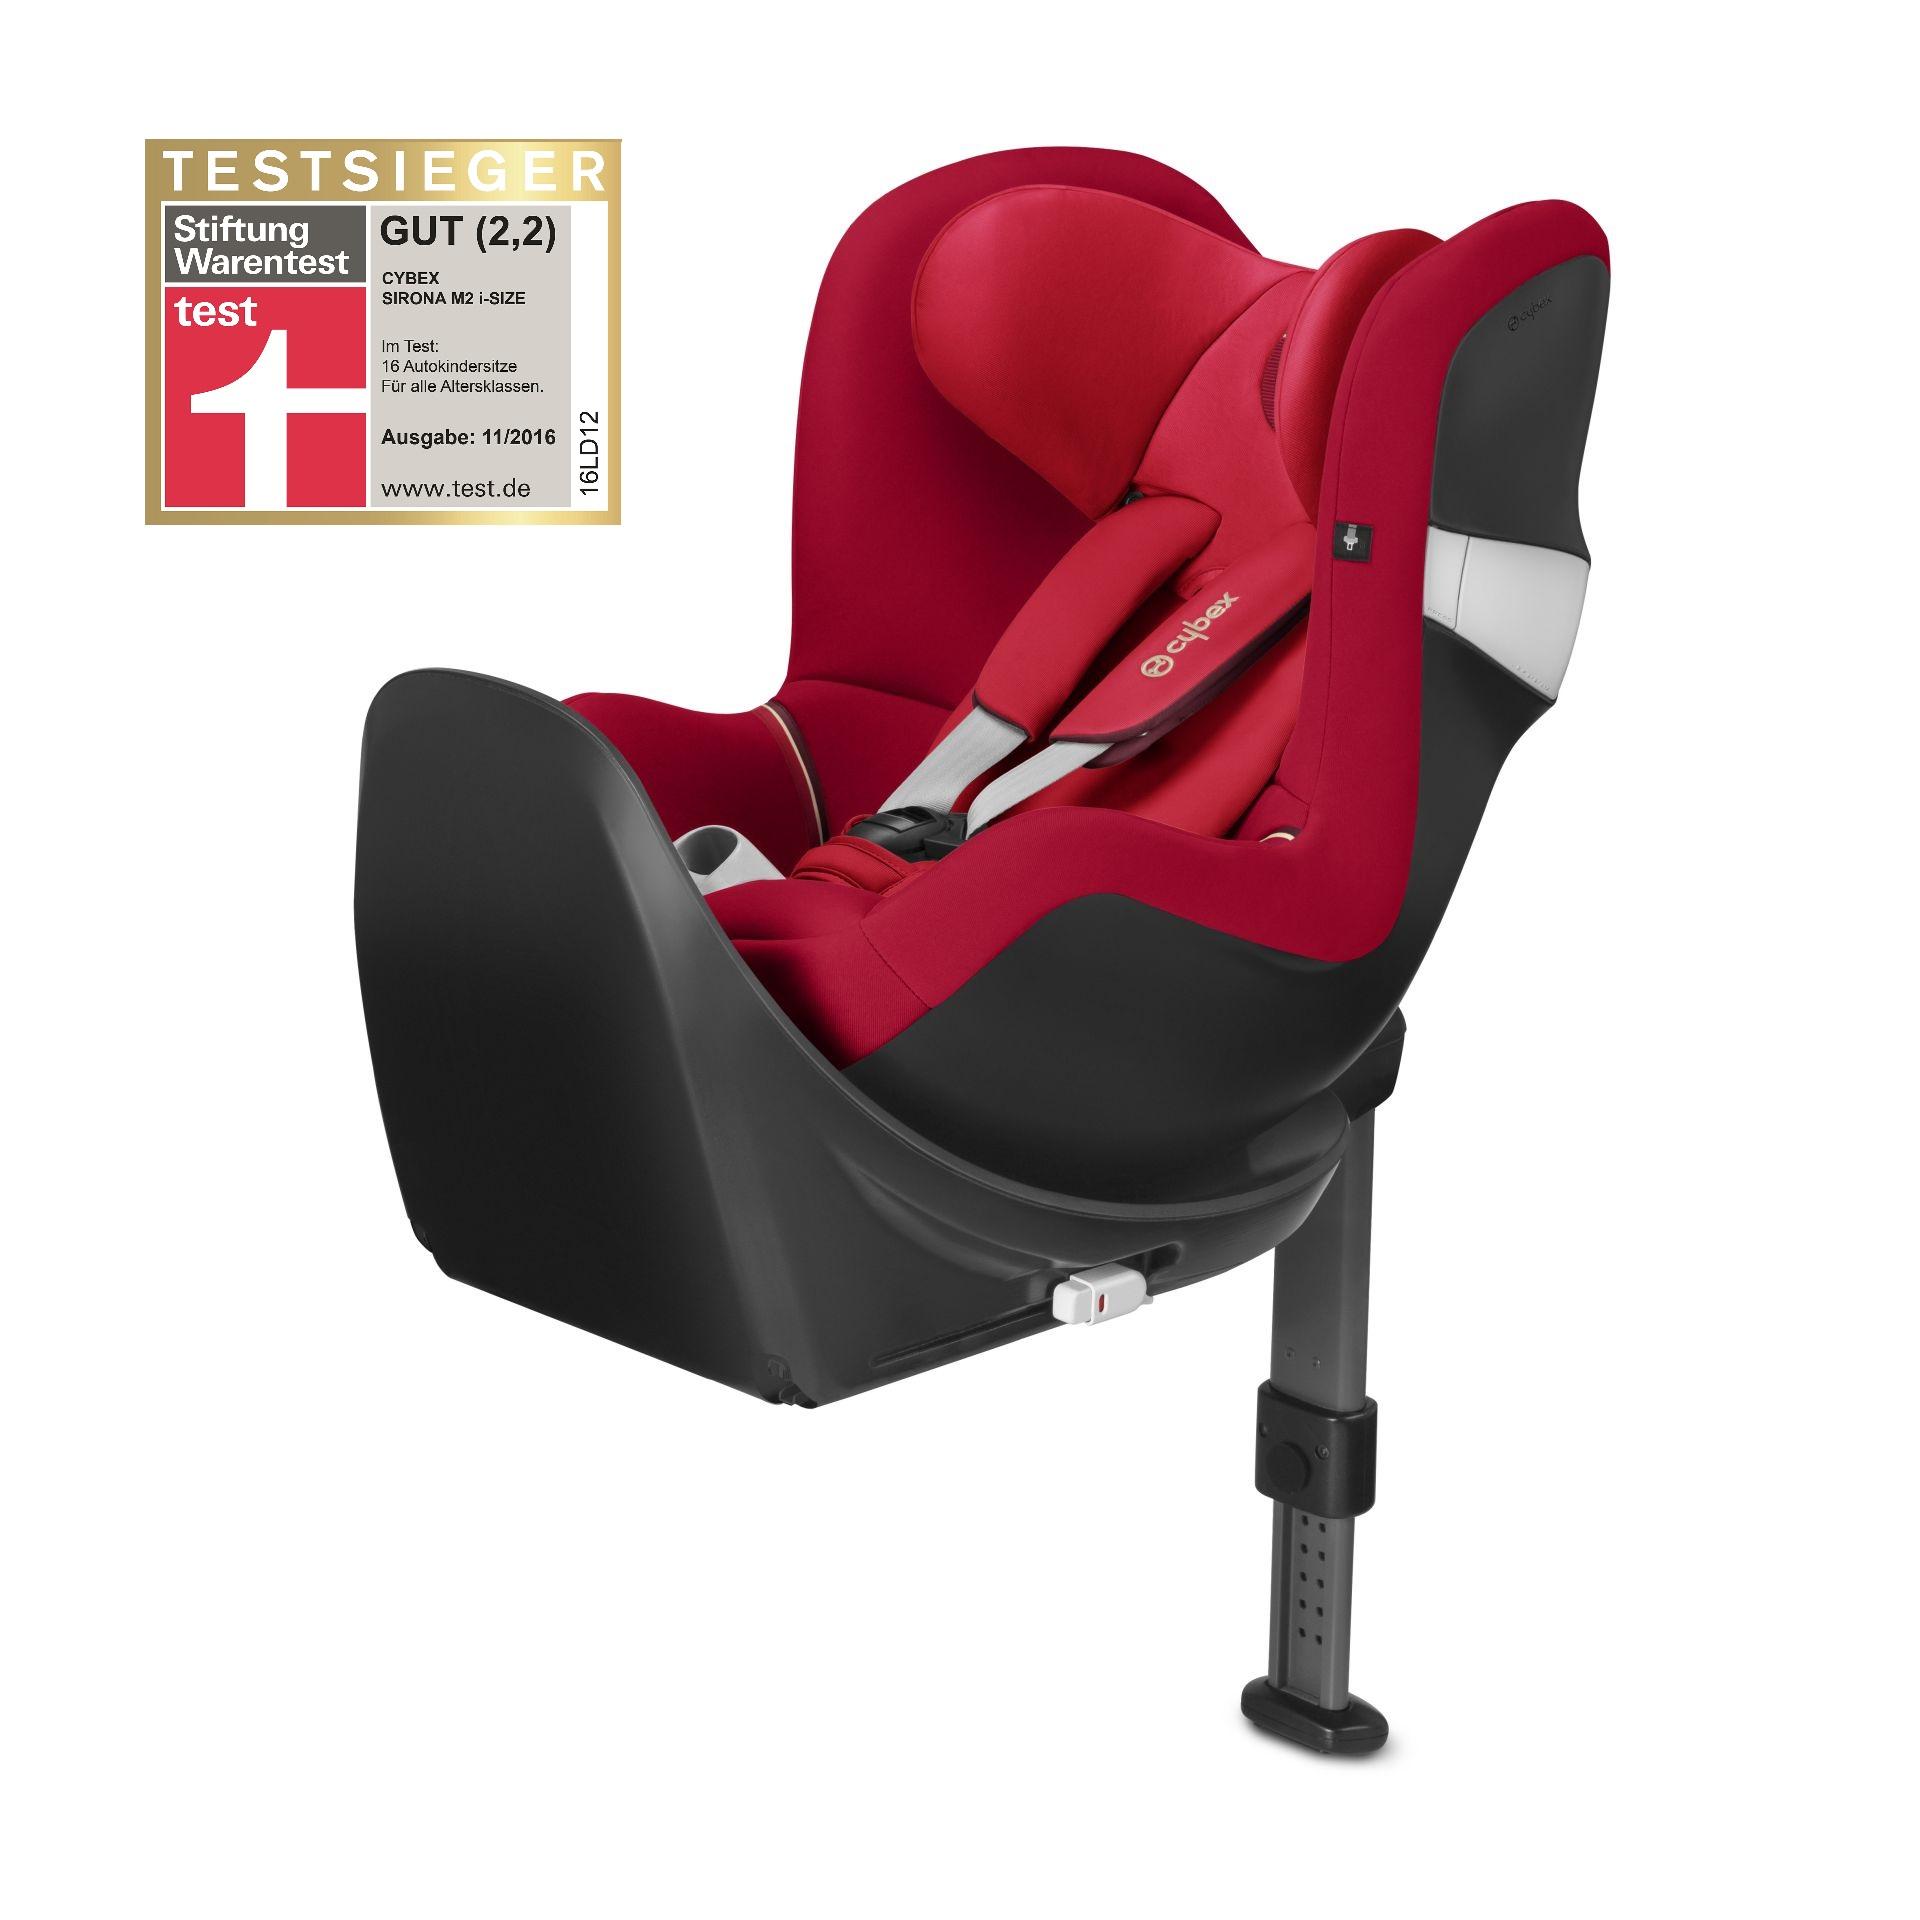 cybex car seat sirona m2 i size buy at kidsroom car seats. Black Bedroom Furniture Sets. Home Design Ideas